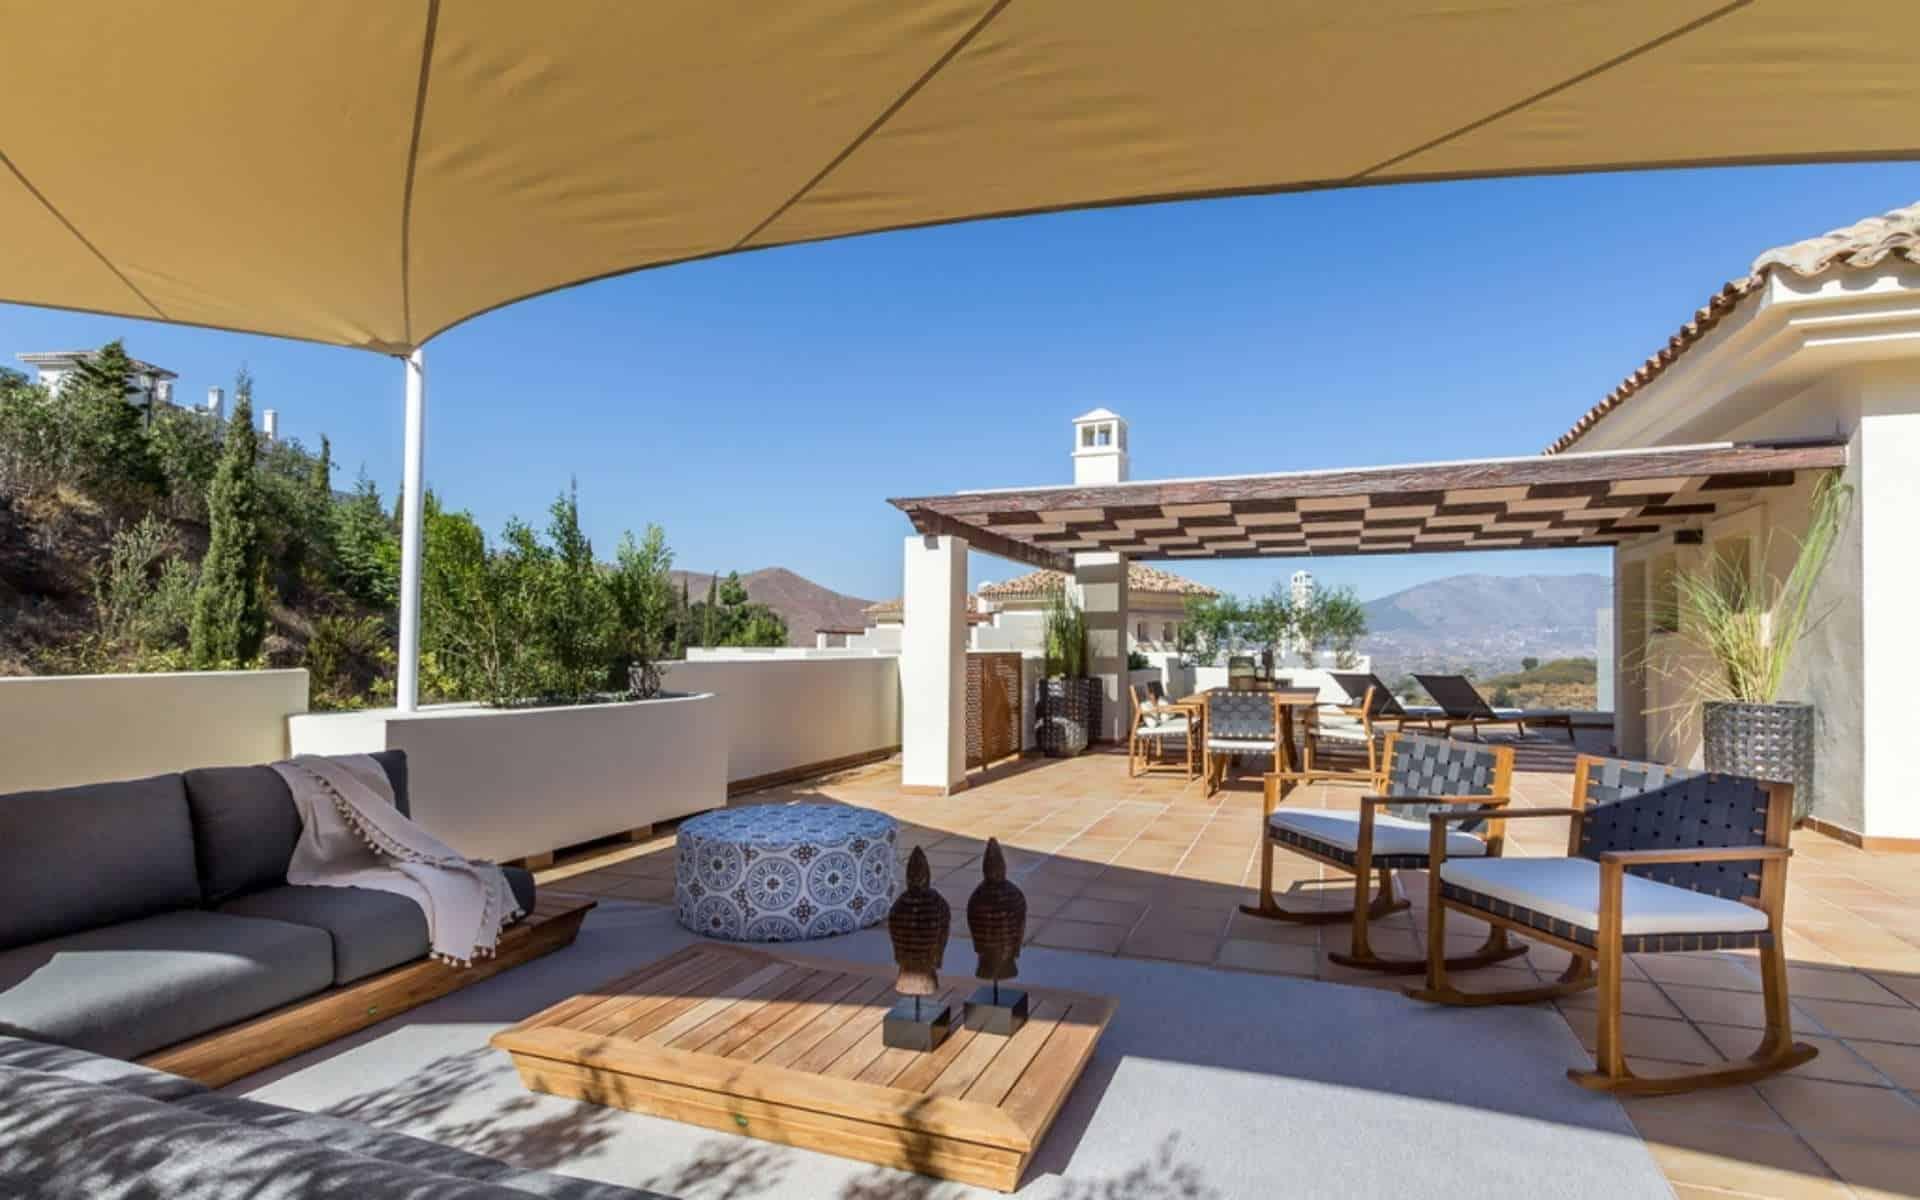 The Oakhill apartment in Sierra de las Nieves a UNESCO Biosphere Reserve near Marbella